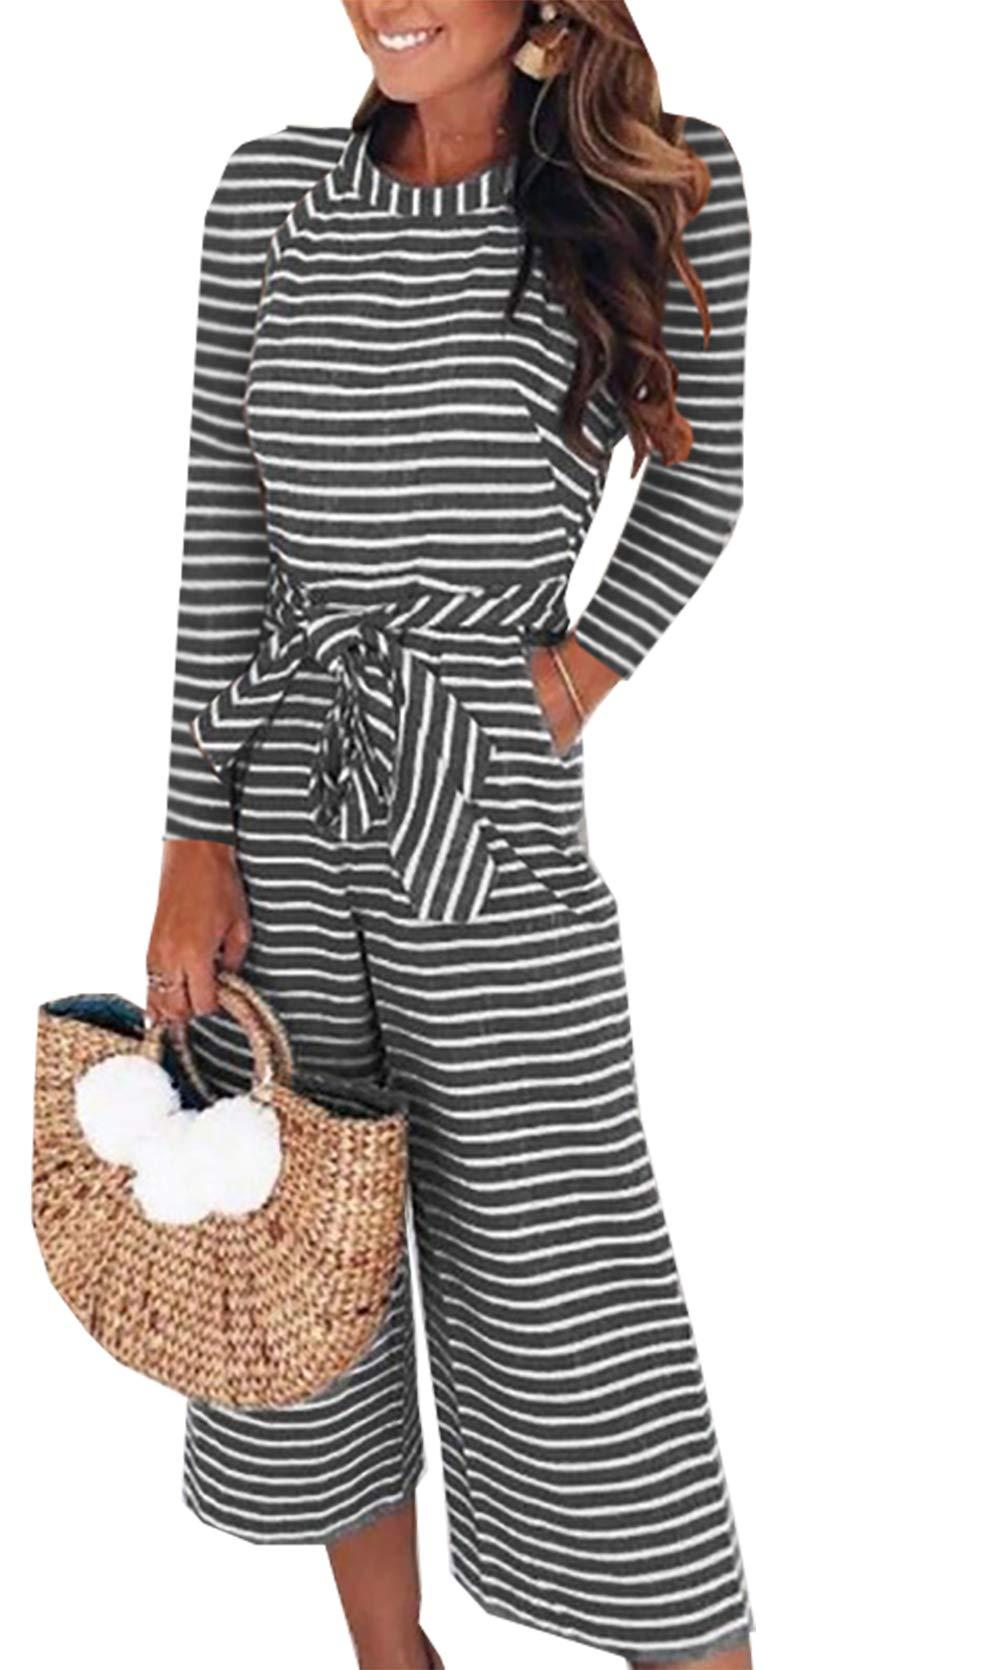 PRETTYGARDEN 2018 Women's Striped Sleeveless Waist Belted Zipper Back Wide Leg Loose Jumpsuit Romper with Pockets (Q_Black, Medium)